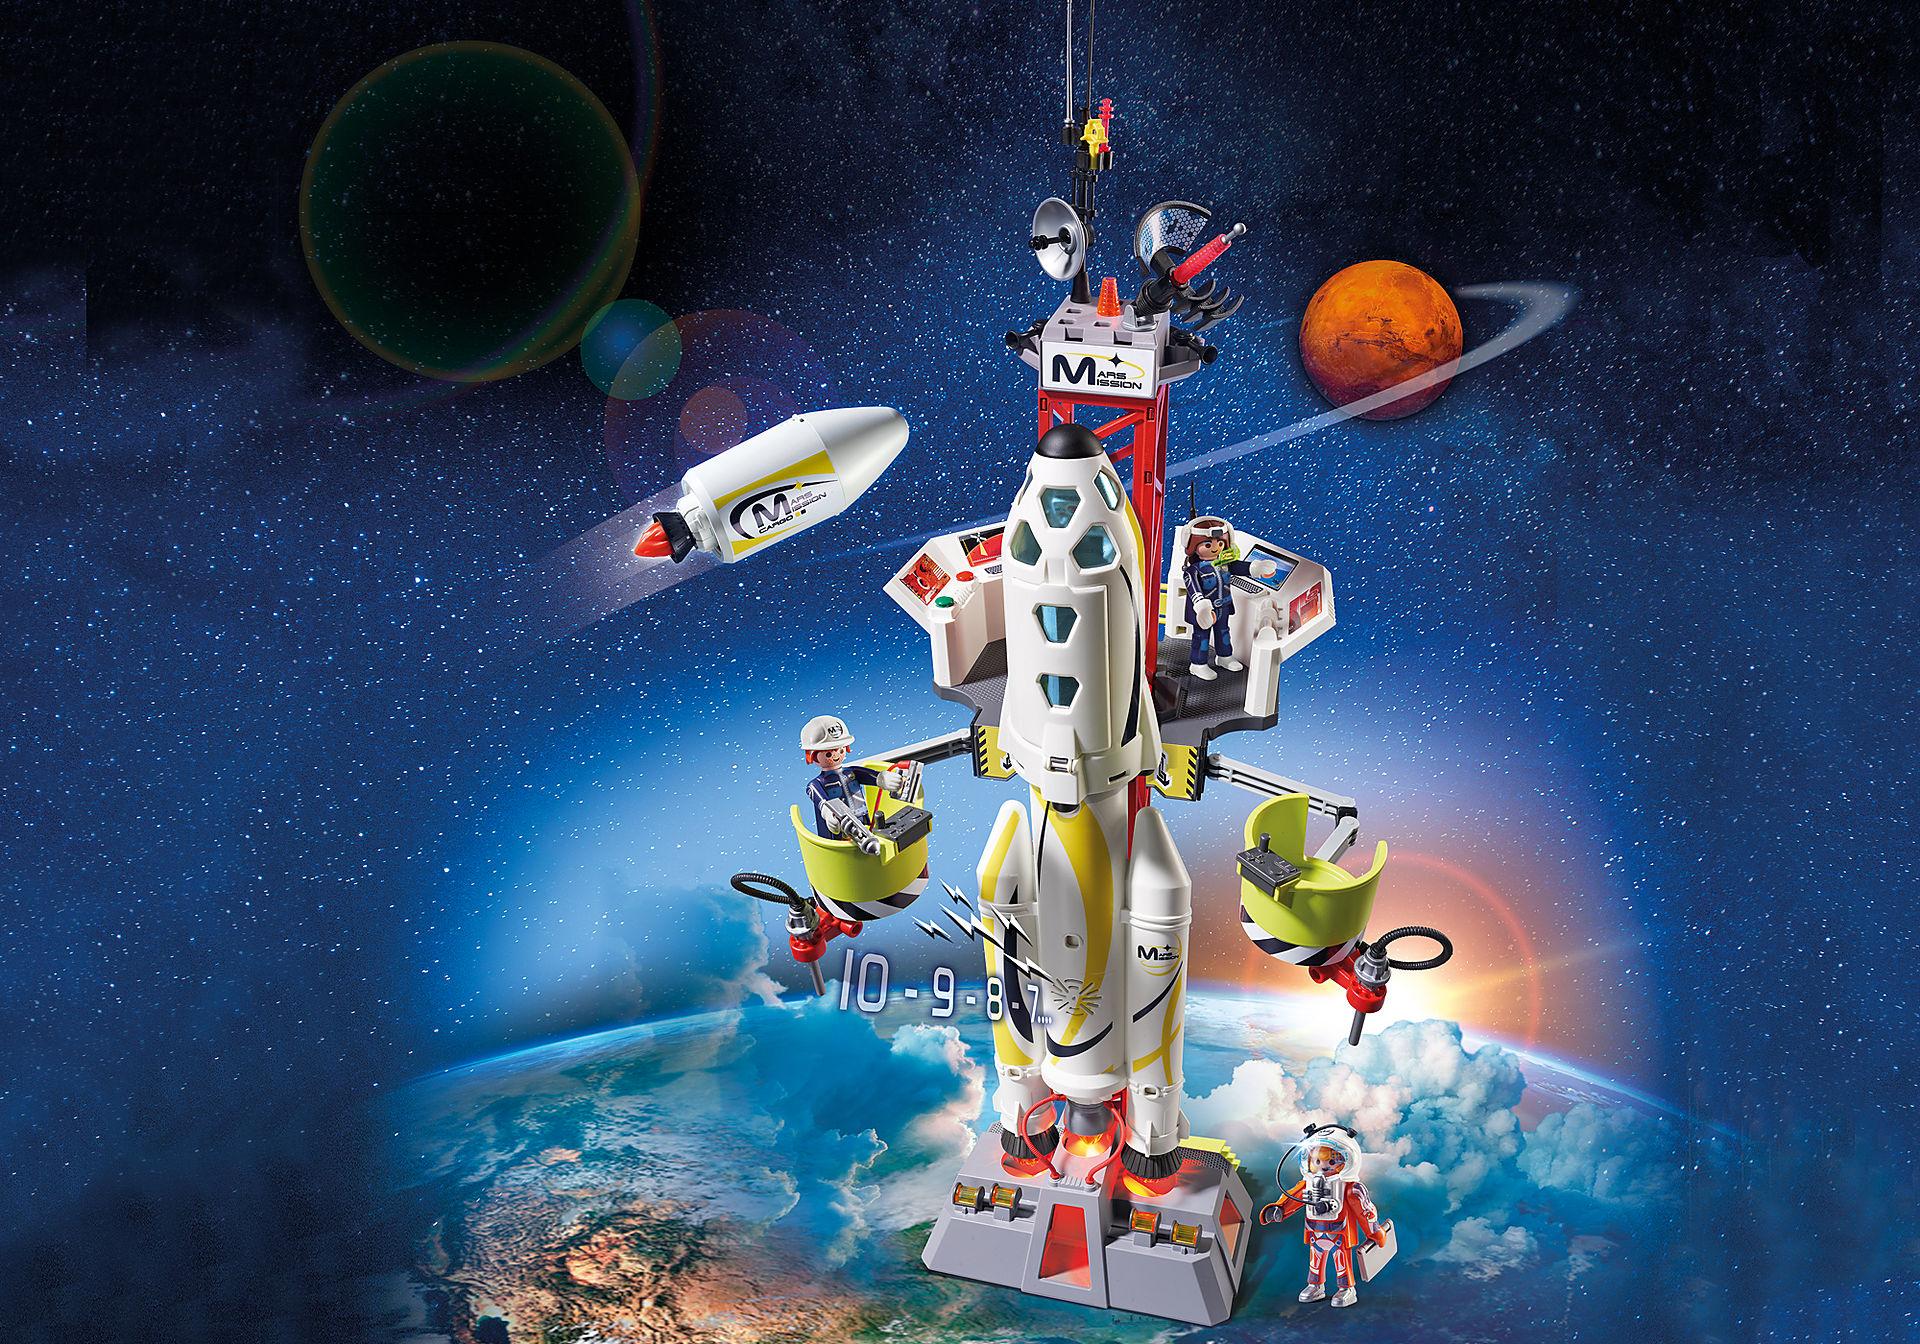 9488 Mars-Rakete mit Startrampe zoom image1